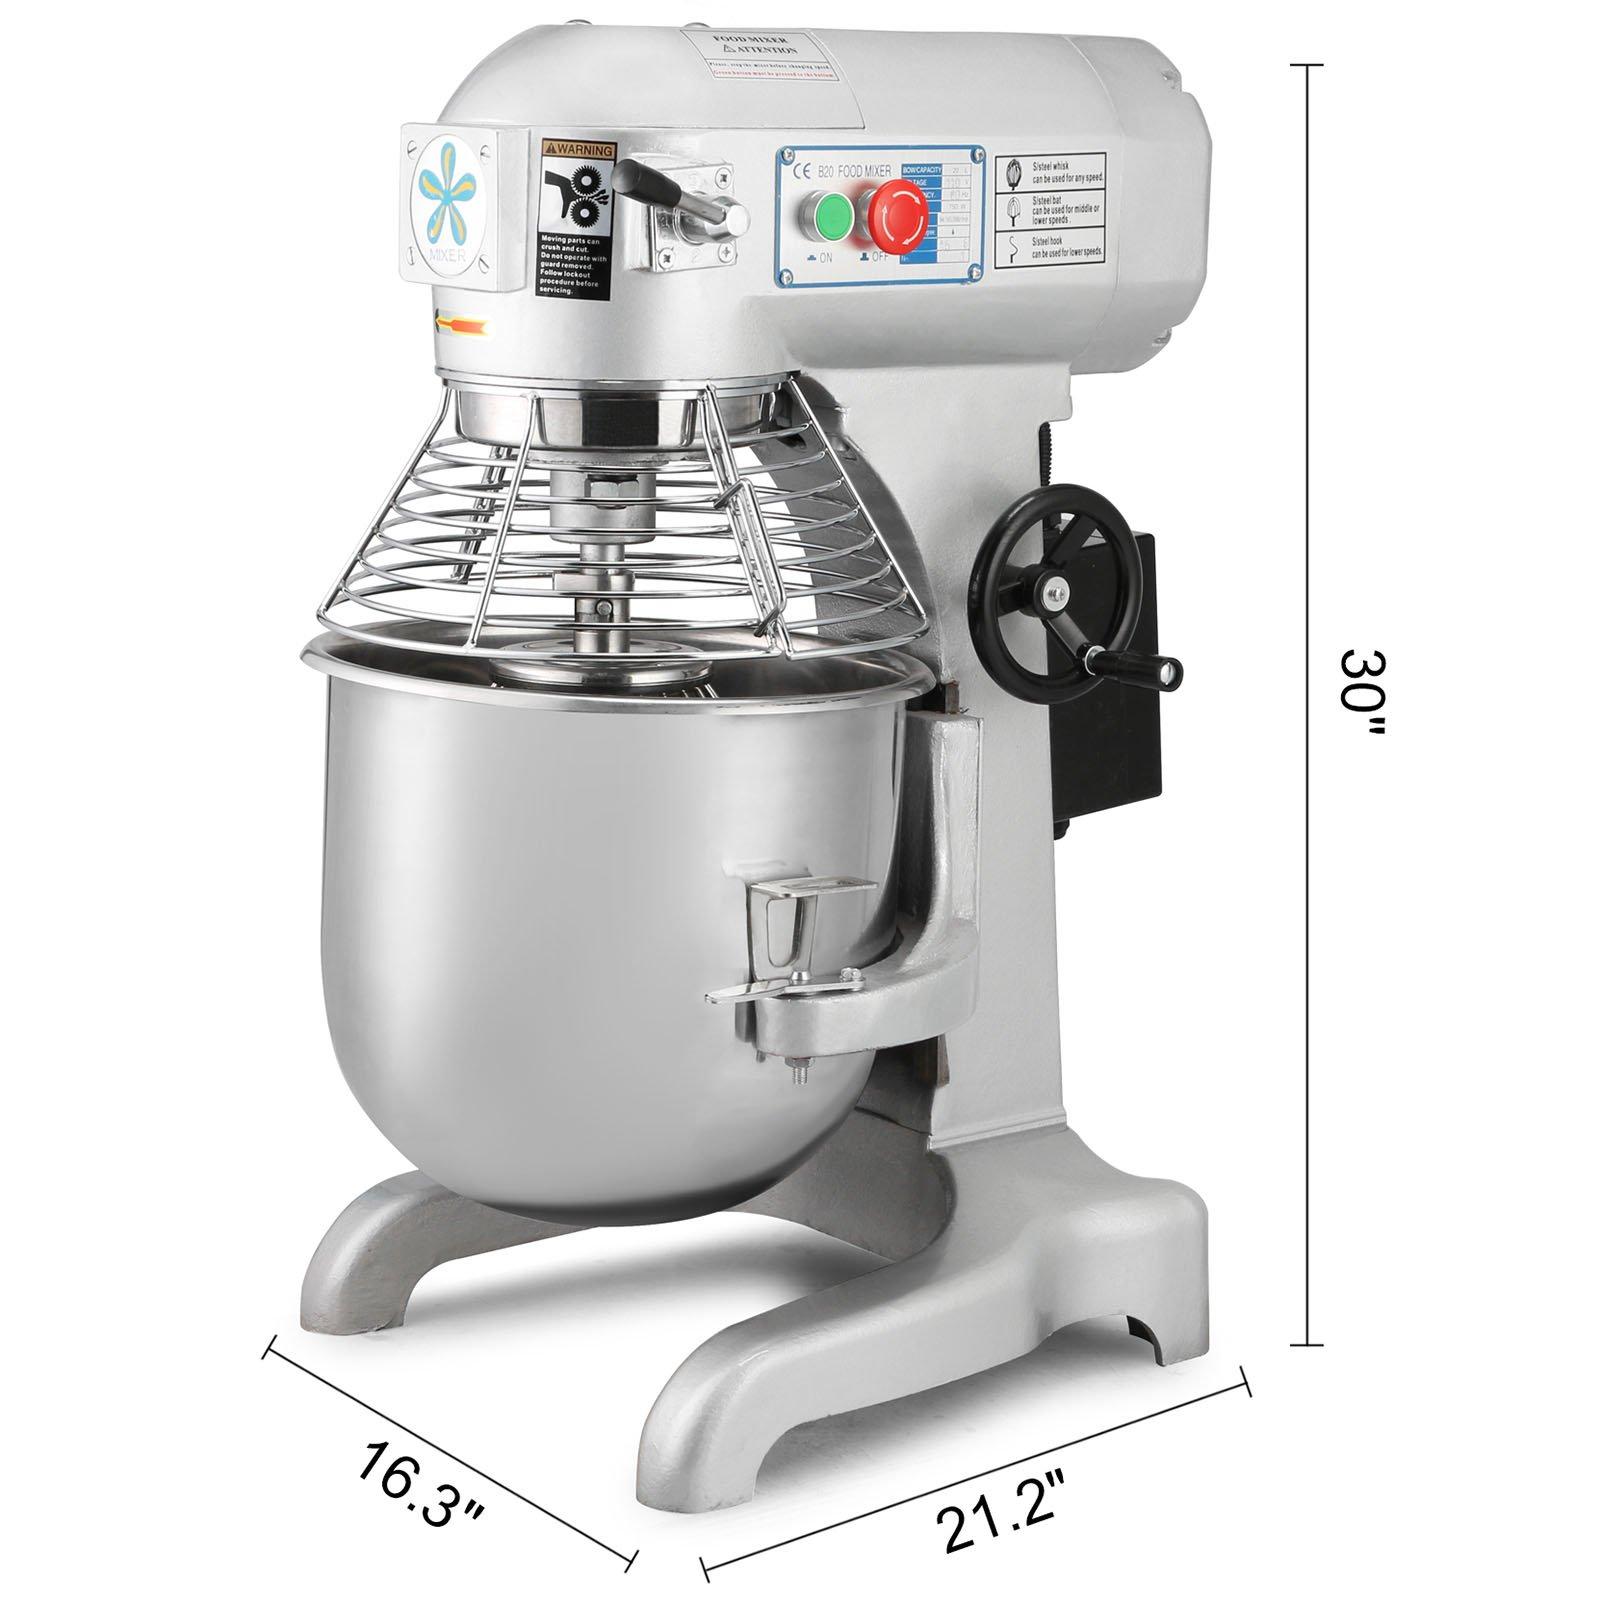 Happybuy Commercial Food Mixer 750W Dough Mixer Maker 3 Speeds Adjustable Commercial Mixer Grinder 94/165/386 RPM Stand Mixer (20 qt) by Happybuy (Image #6)